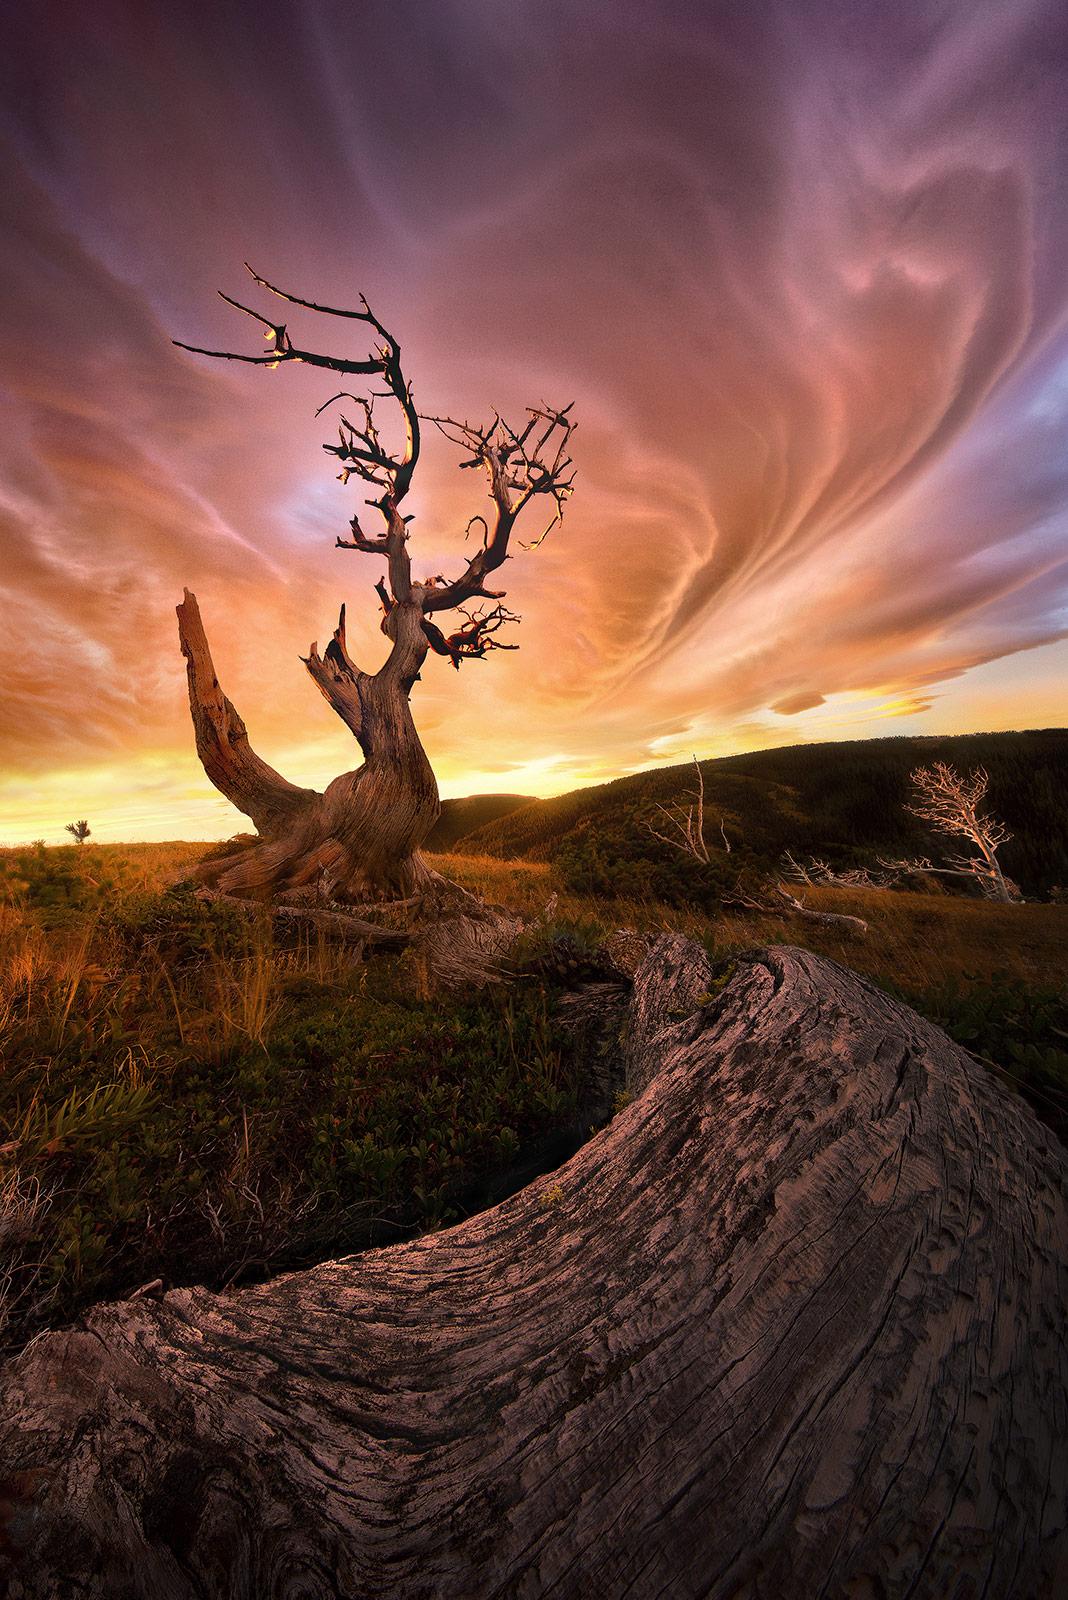 lenticular, blackfoot, montana, old, tree, photo